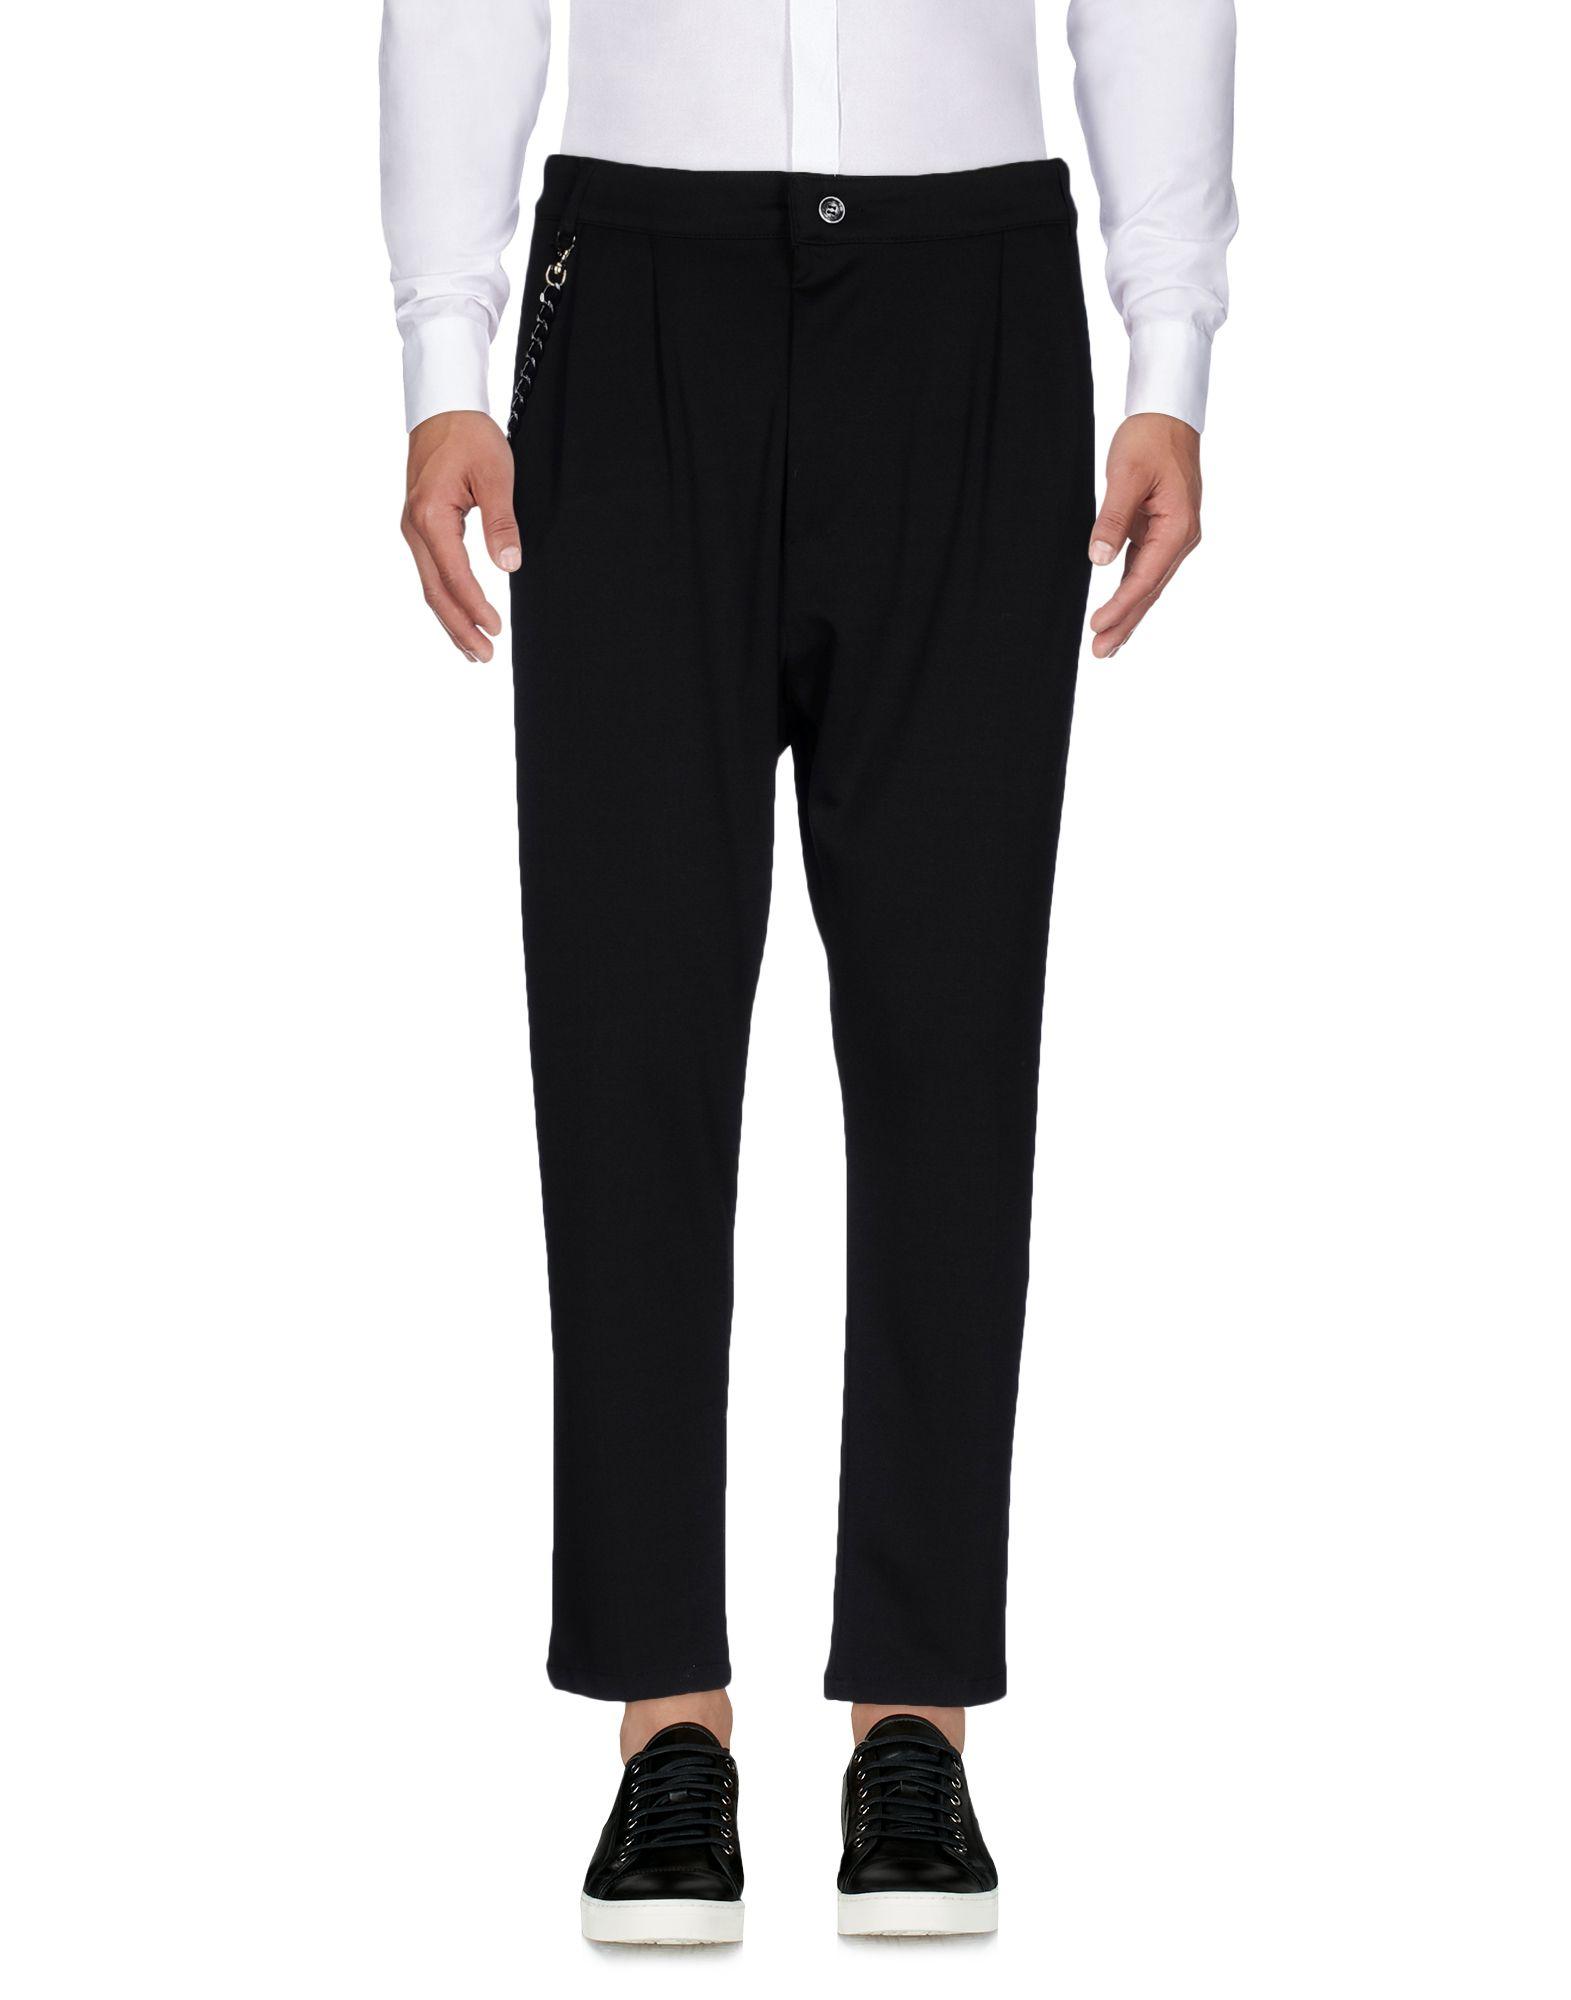 #OUTFIT Повседневные брюки random 10 items   fashion 5 outfit   5